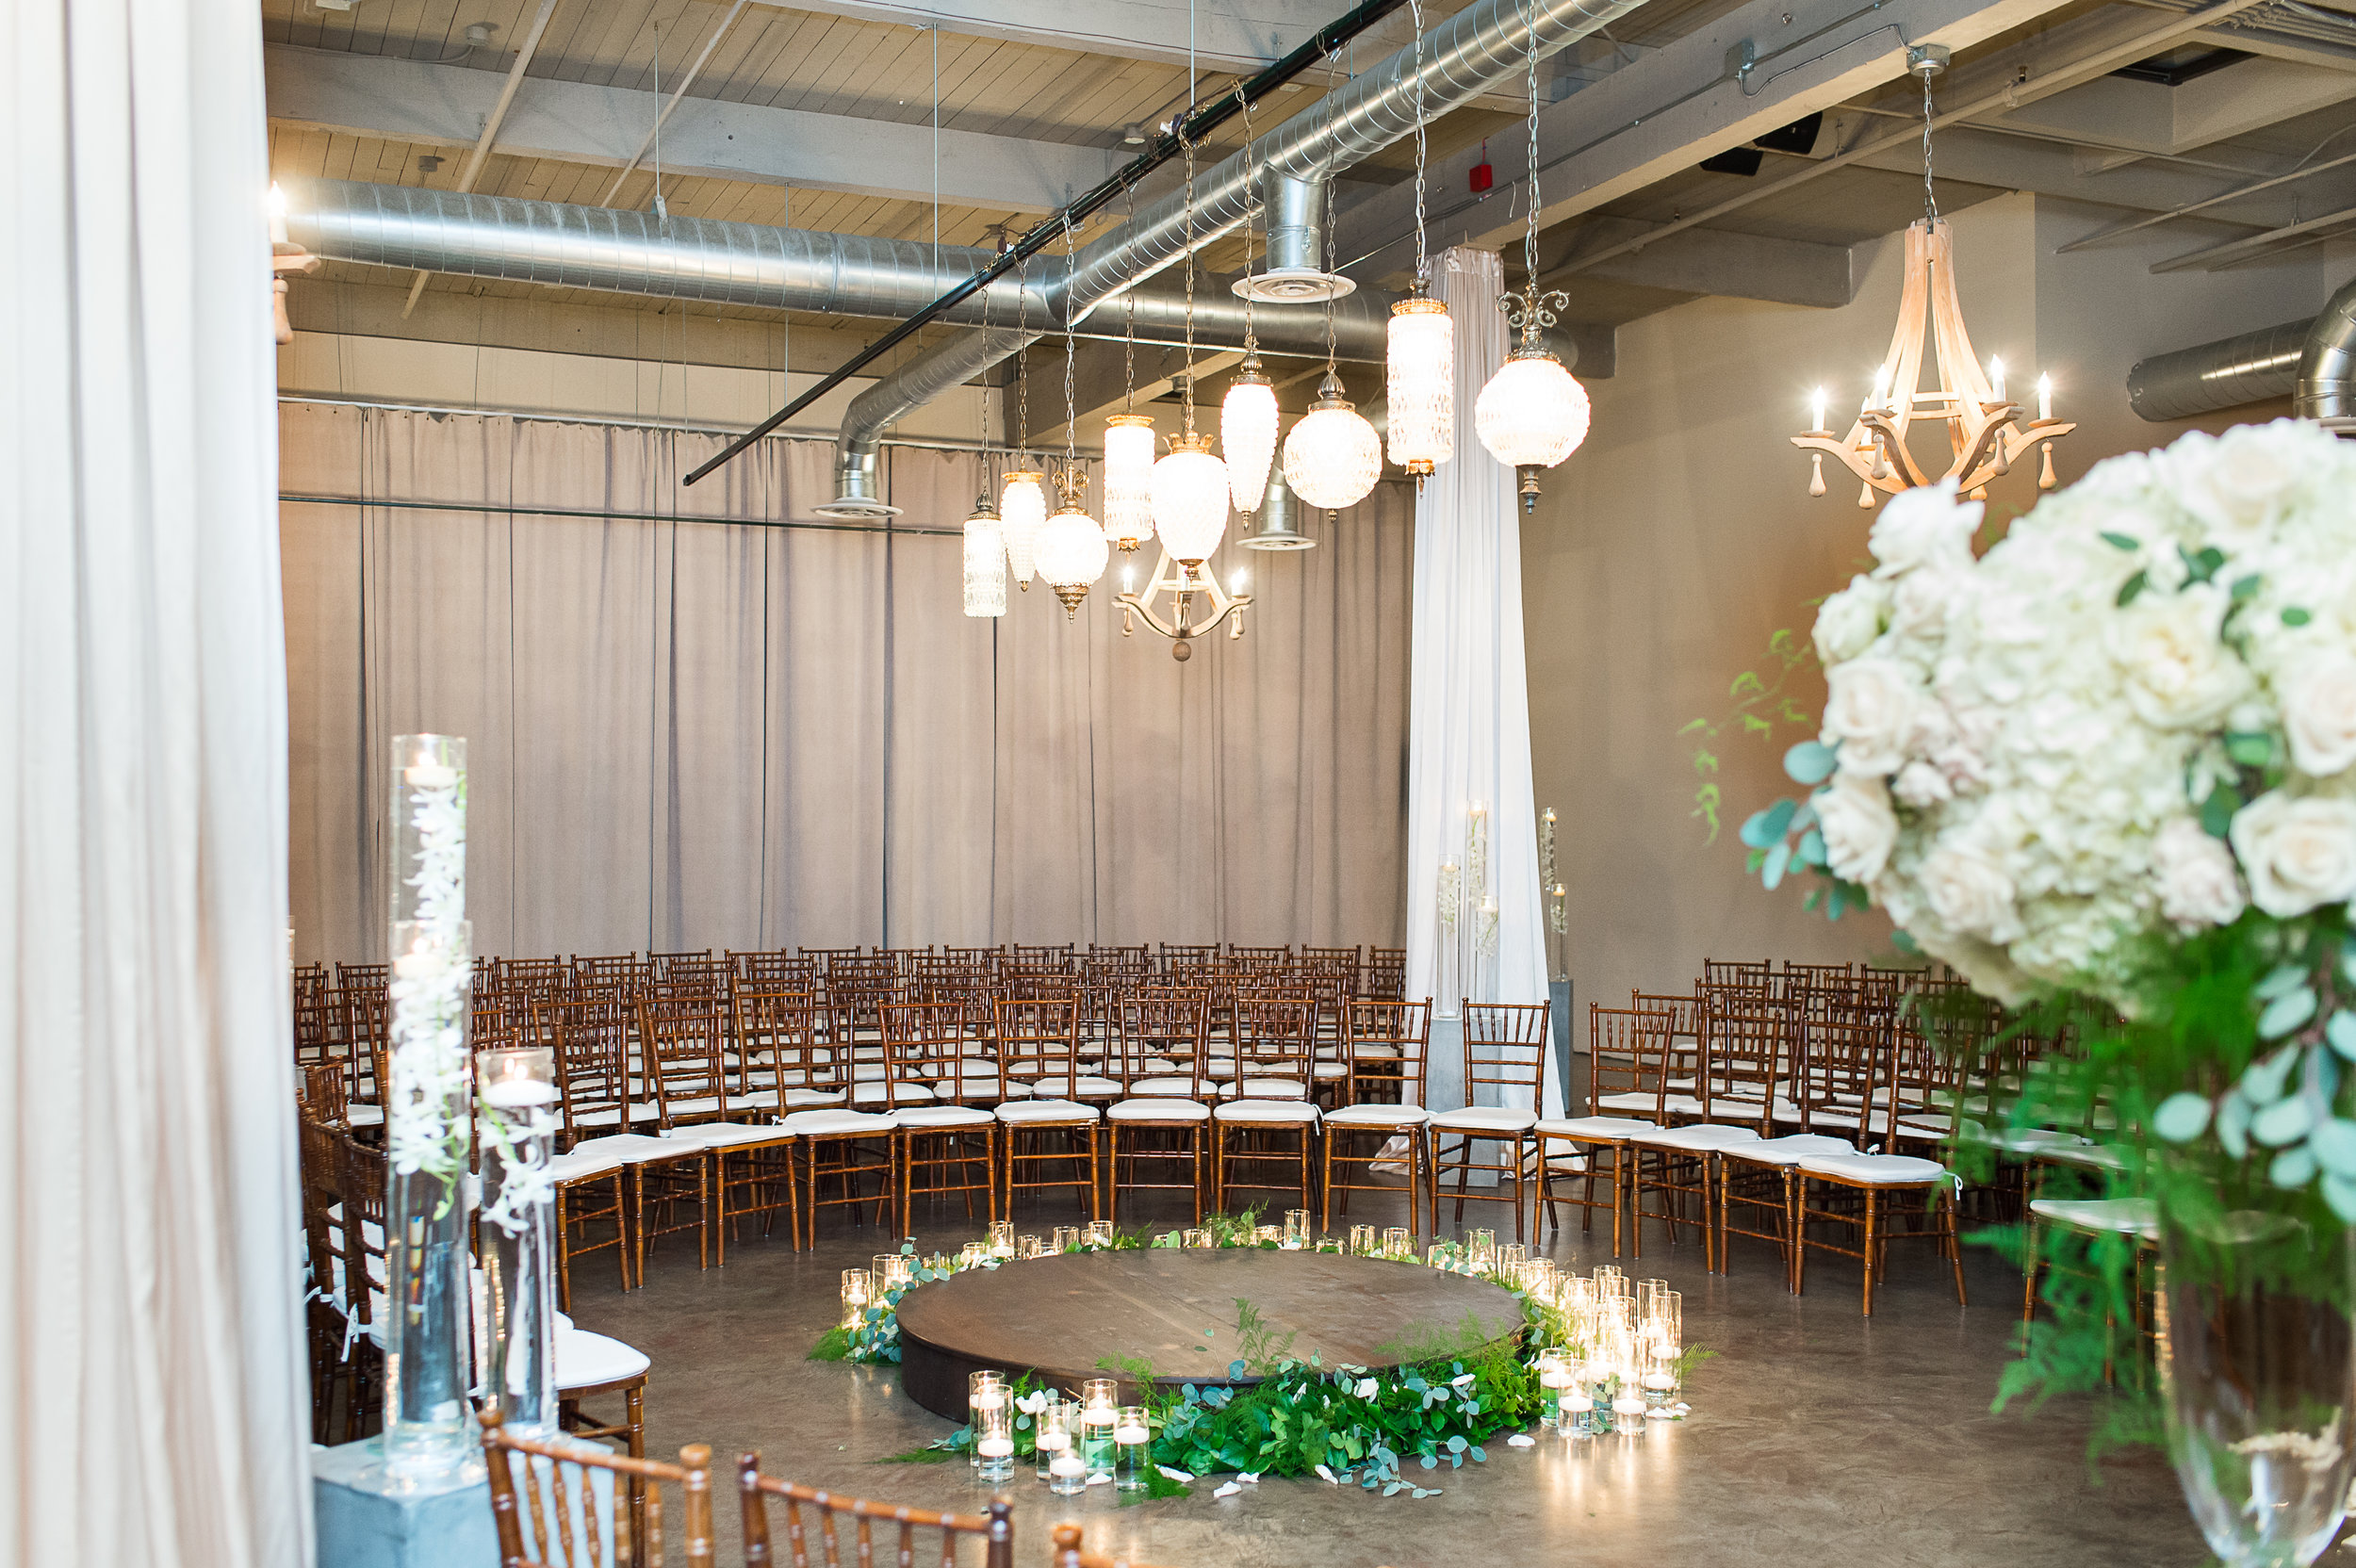 JJ-wedding-Van-Wyhe-Photography-305.jpg